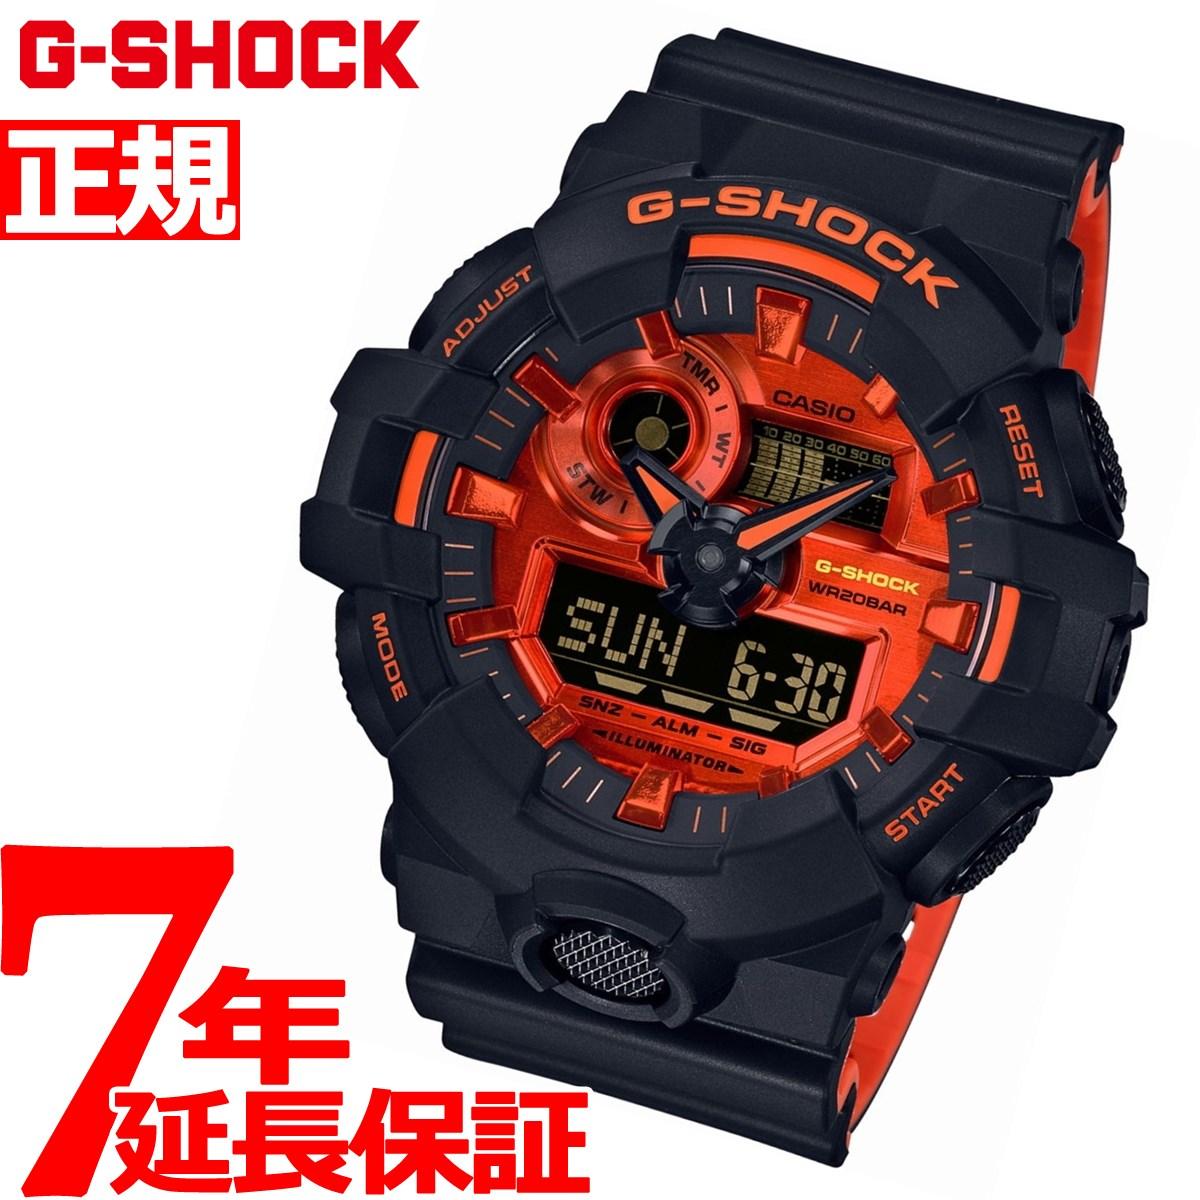 G-SHOCK アナデジ メンズ 腕時計 BRIGHT ORANGE COLOR カシオ CASIO GA-700BR-1AJF【2018 新作】